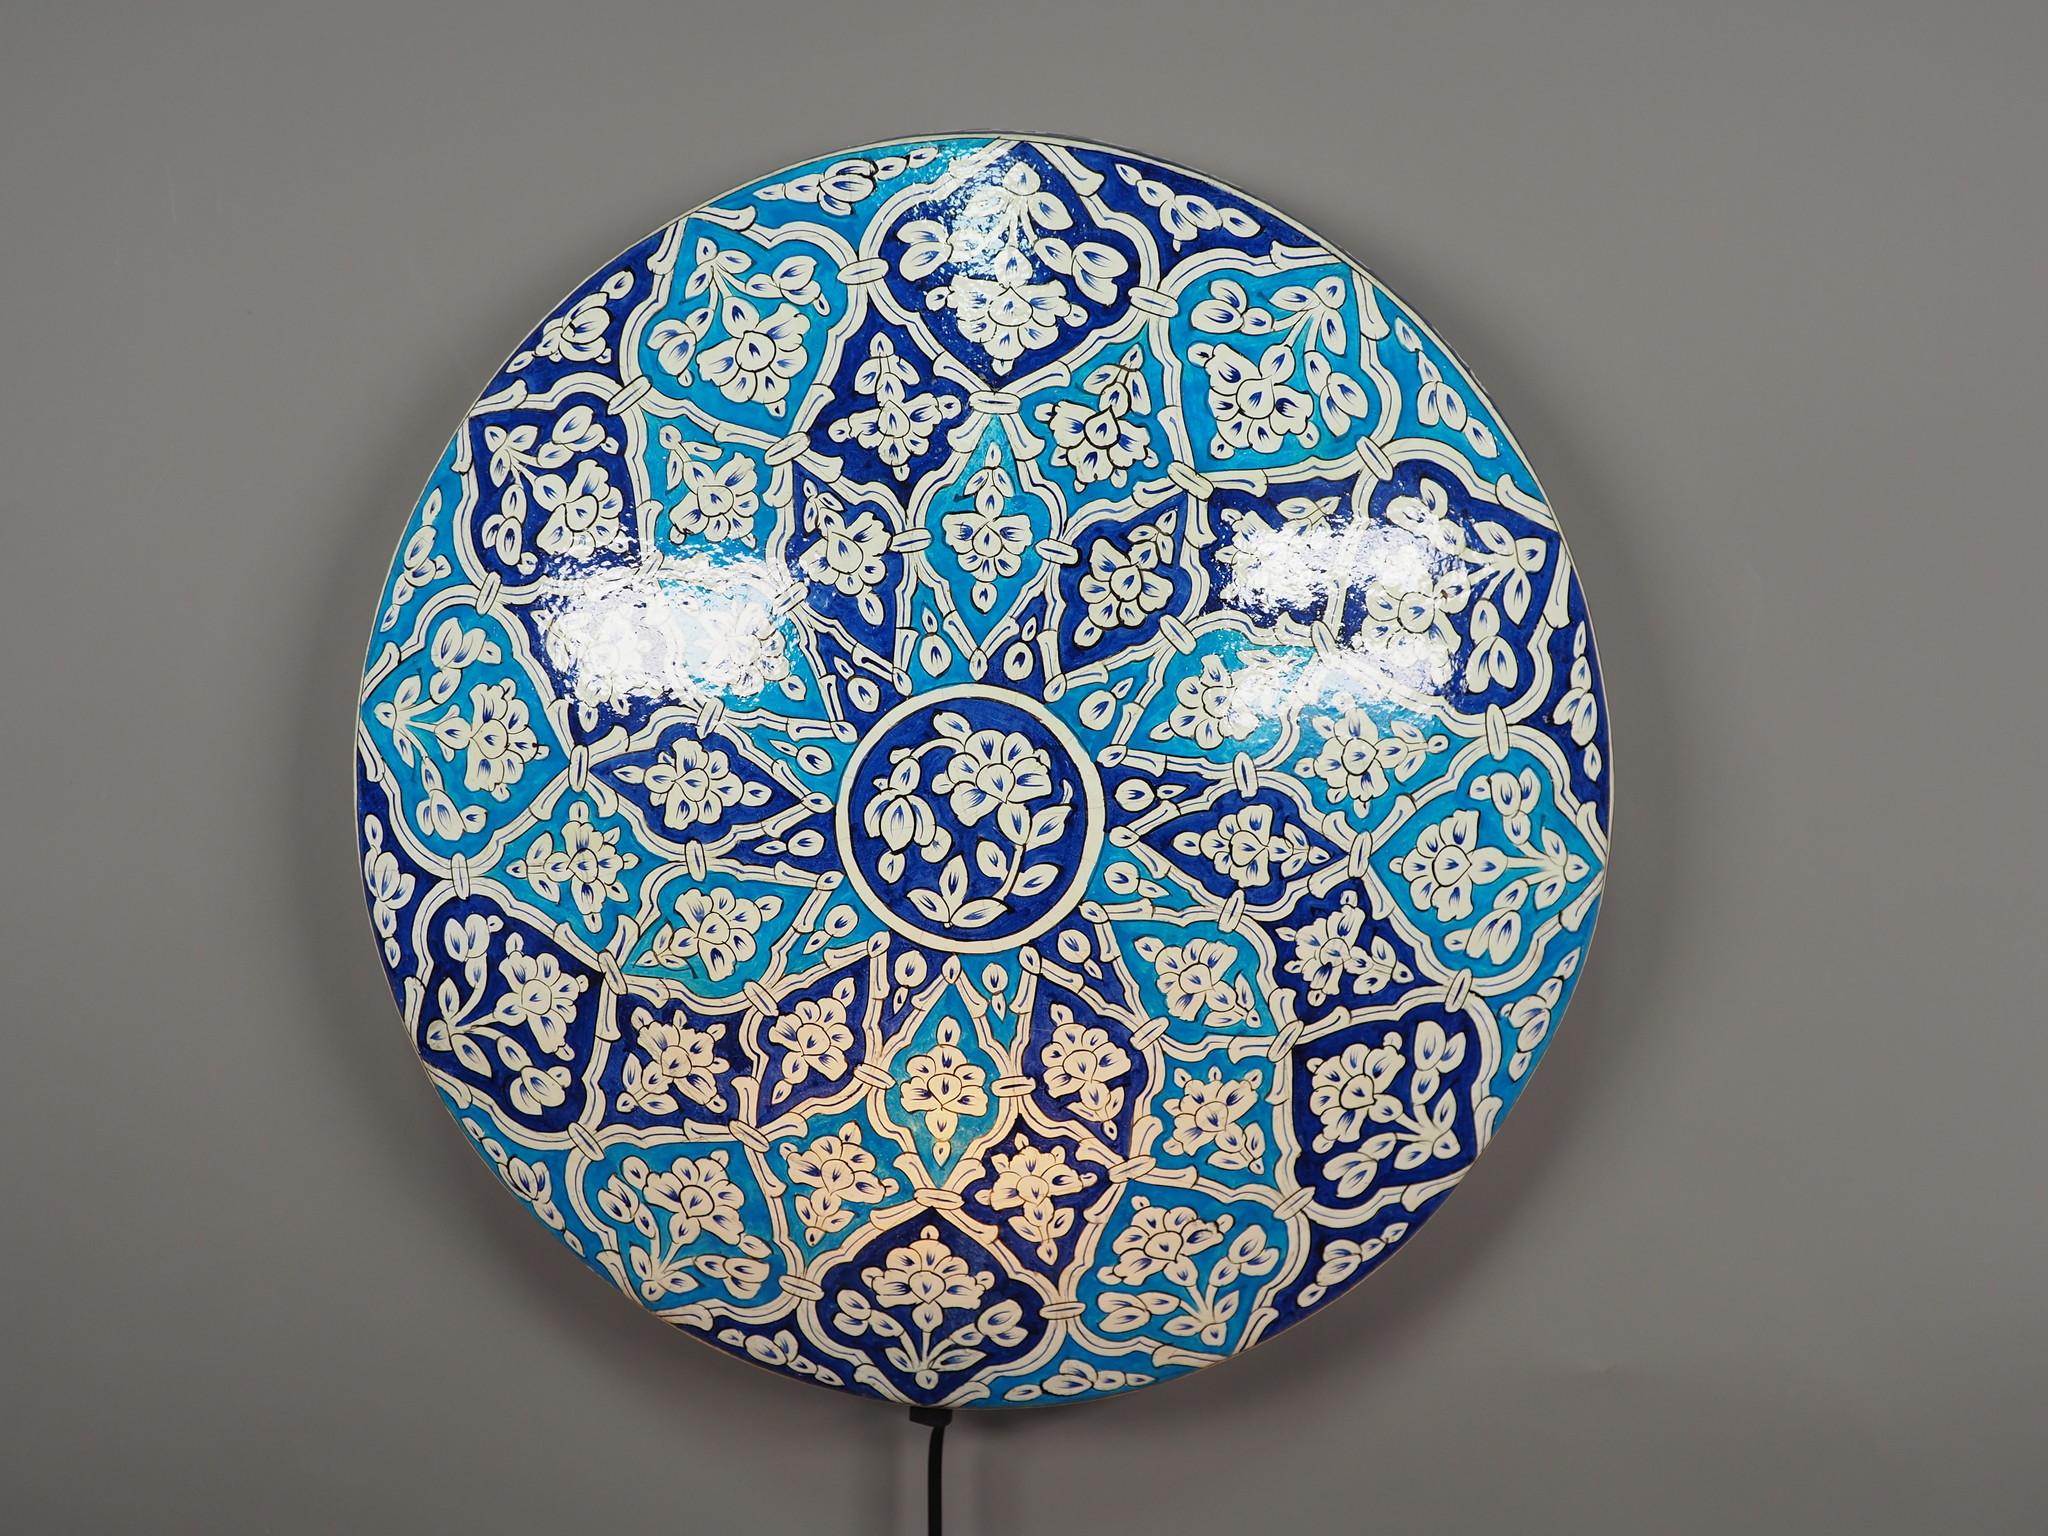 orientalische handbemalte Lampe Kamelleder  Wandlampe  aus Multan Pakistan W/7